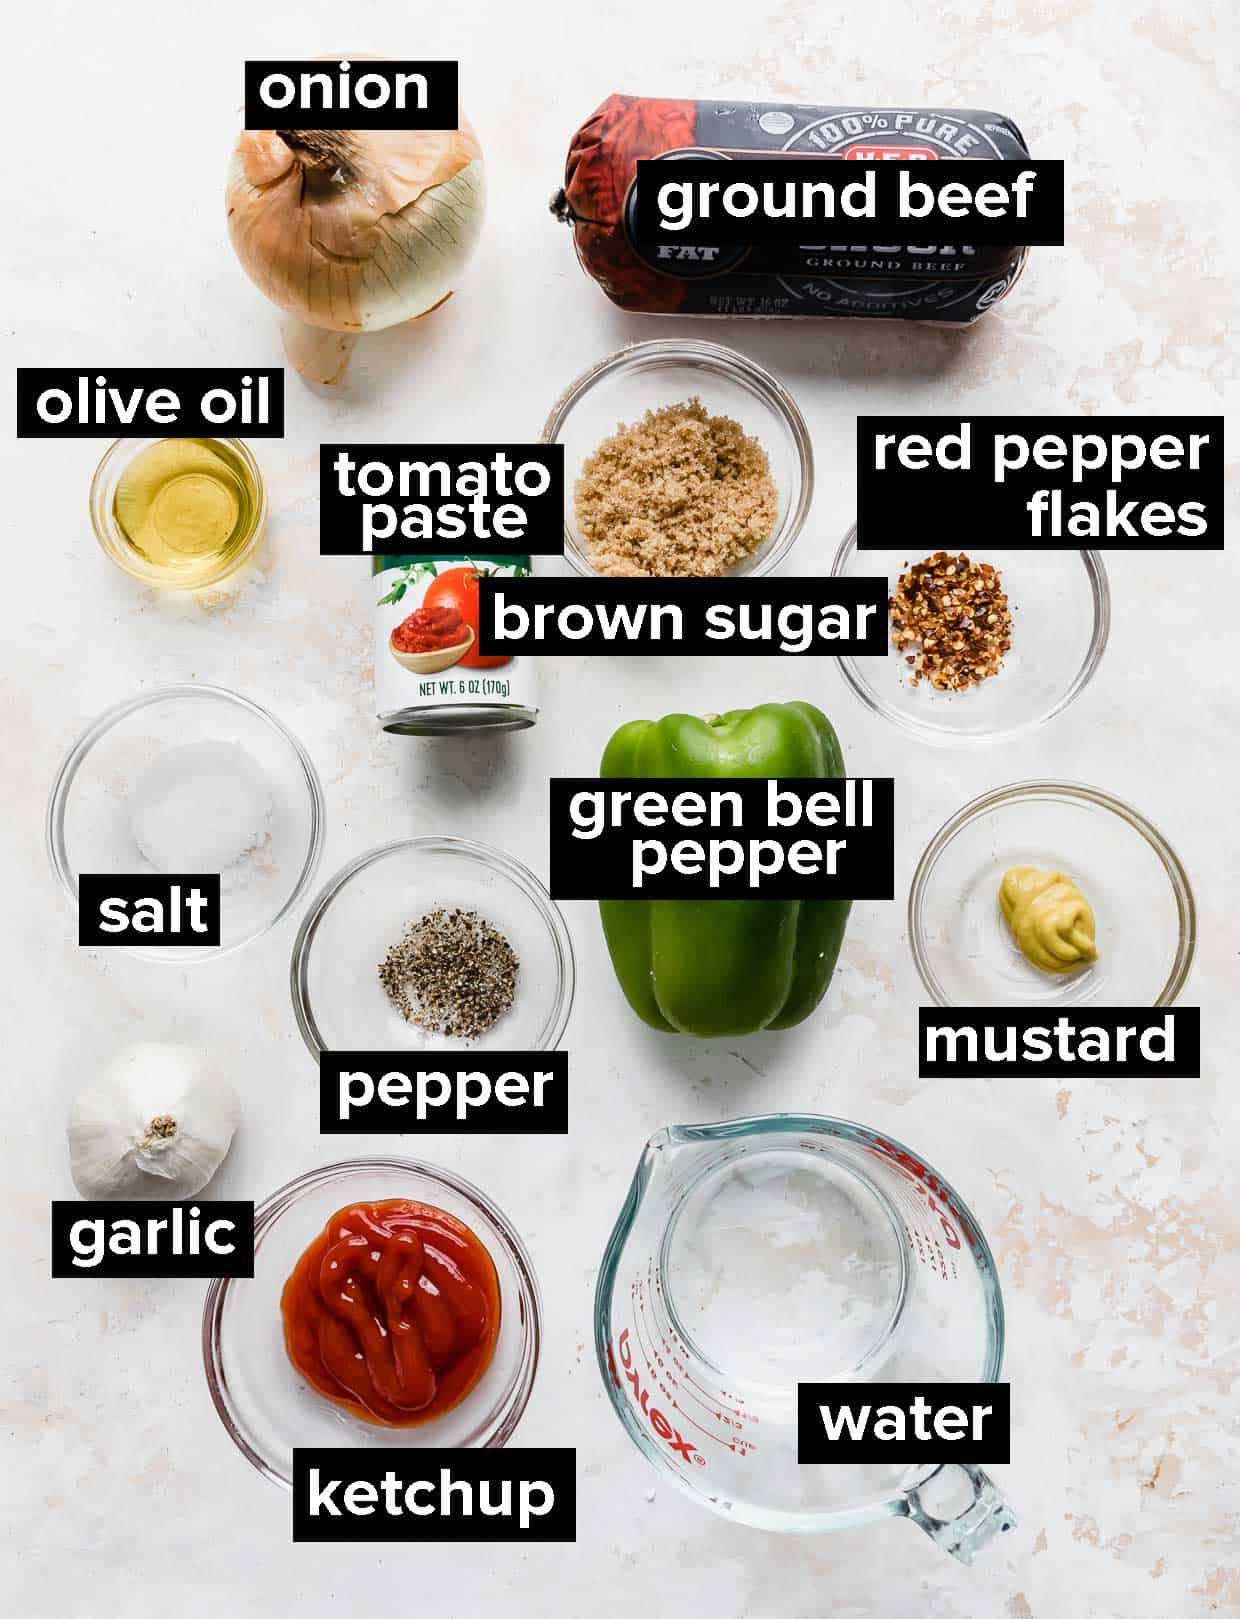 Ingredients used to make homemade sloppy joes.